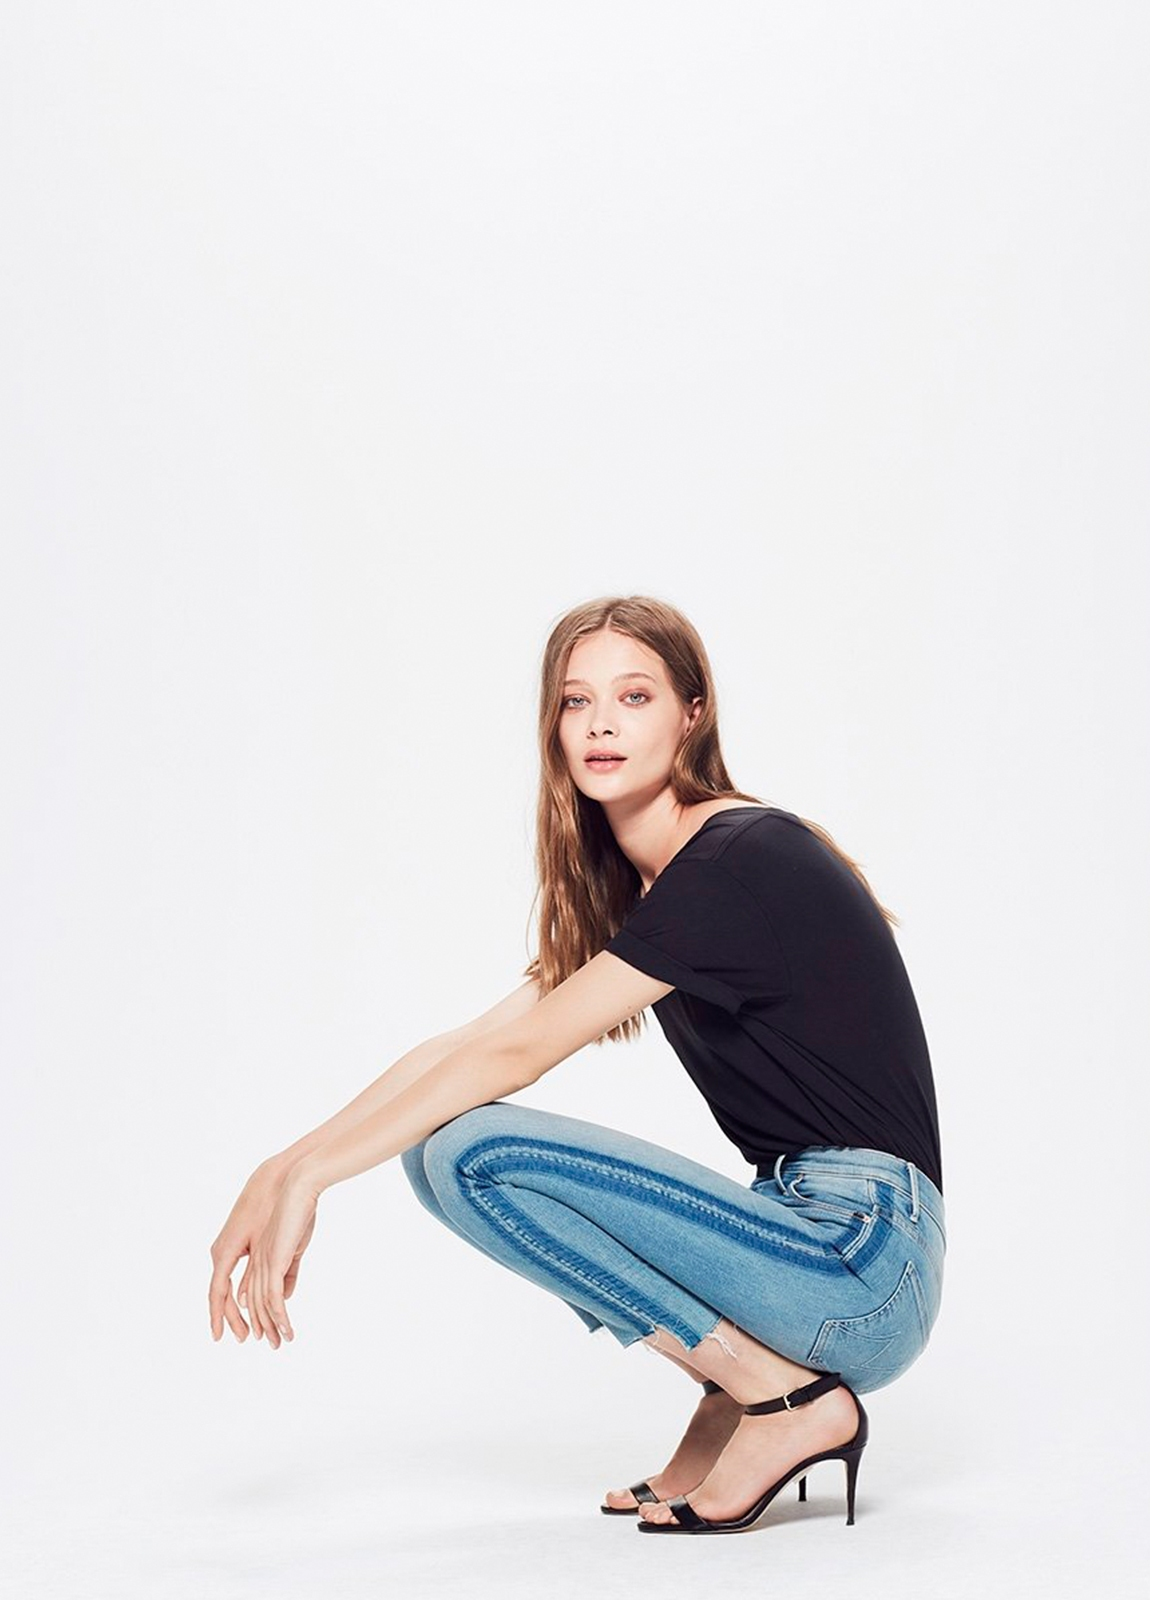 Pantalón tejano SIDE STRIPE JEANS color azul denim y raya lateral. 94% Algodón 5% Poliéster 1% Elastano.